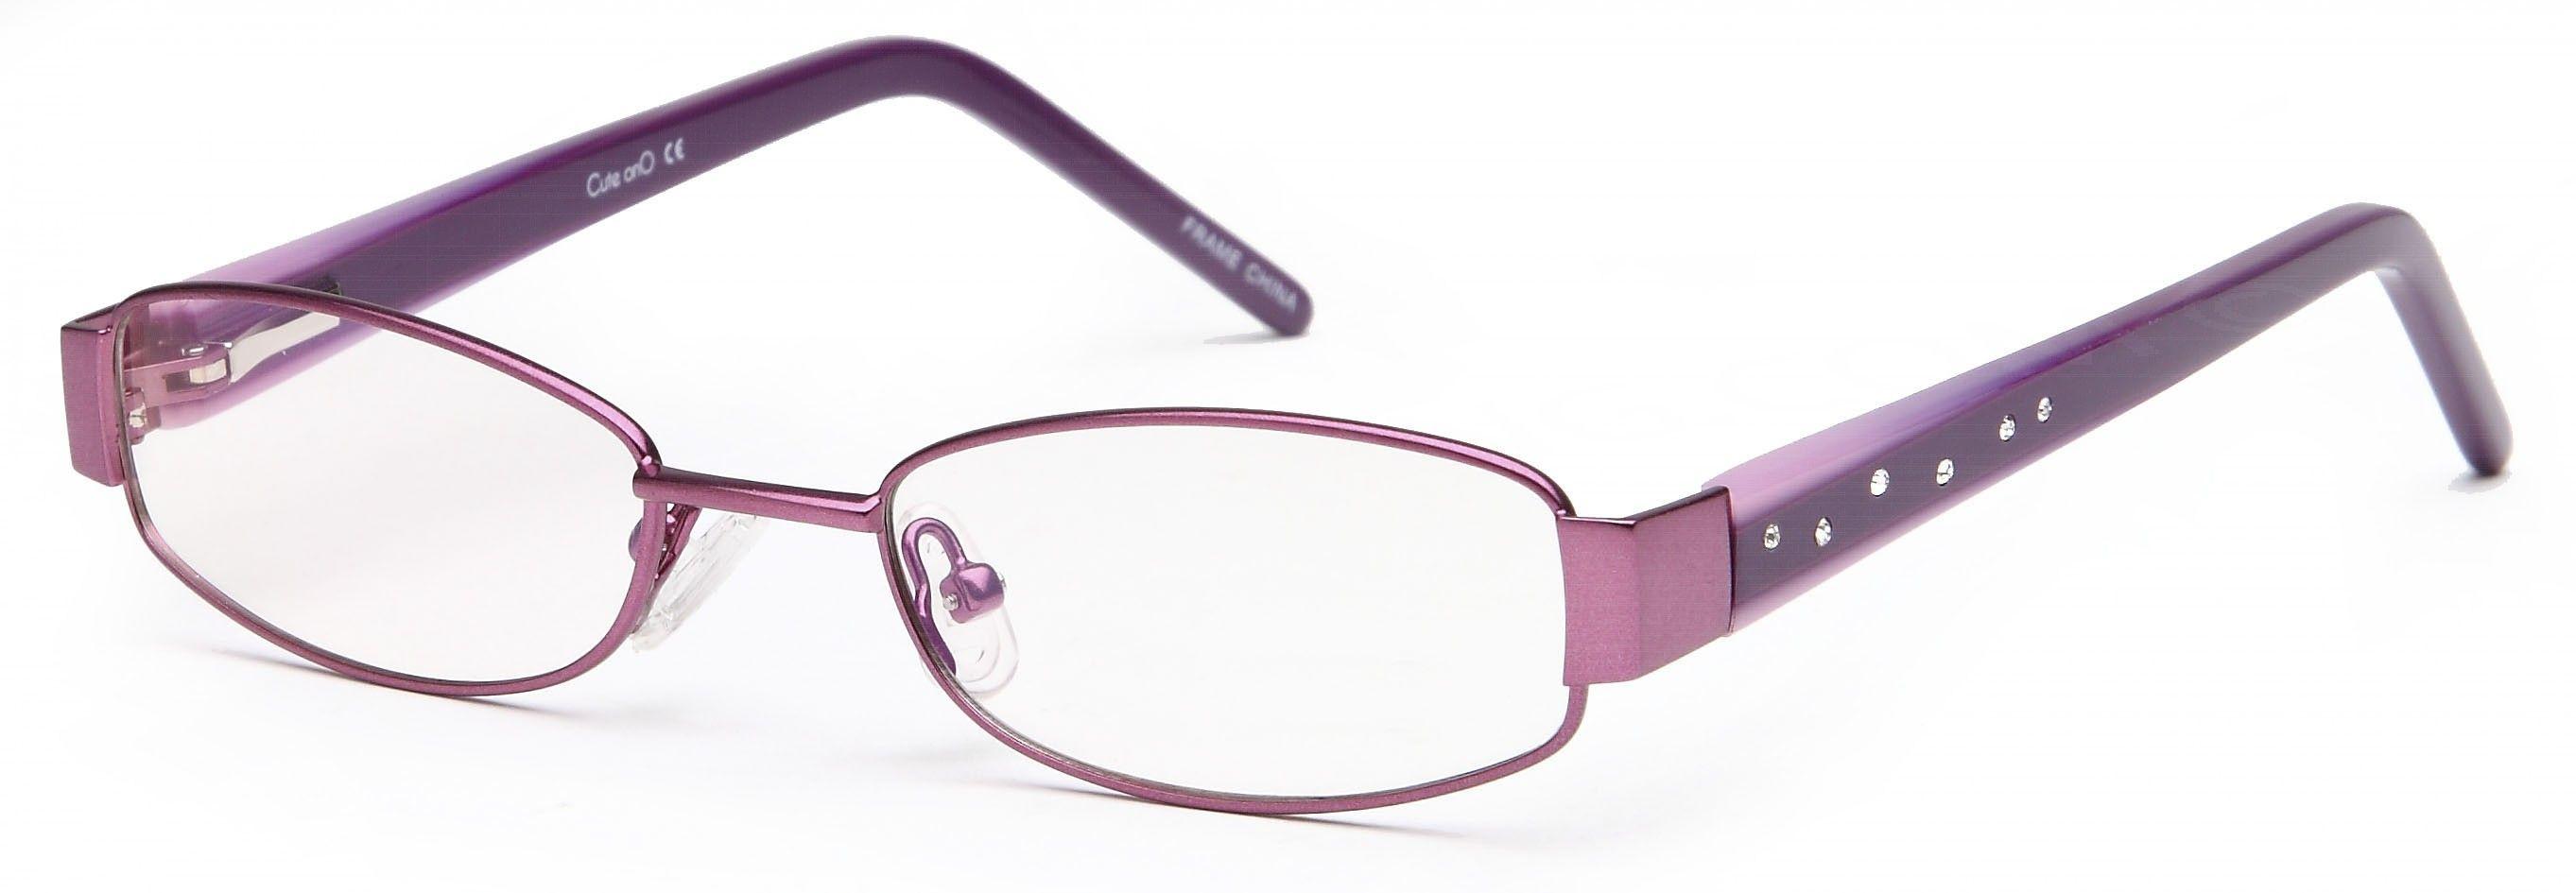 purple Glasses   ... Star Studded Prescription Eye Glasses Frames Rx ...